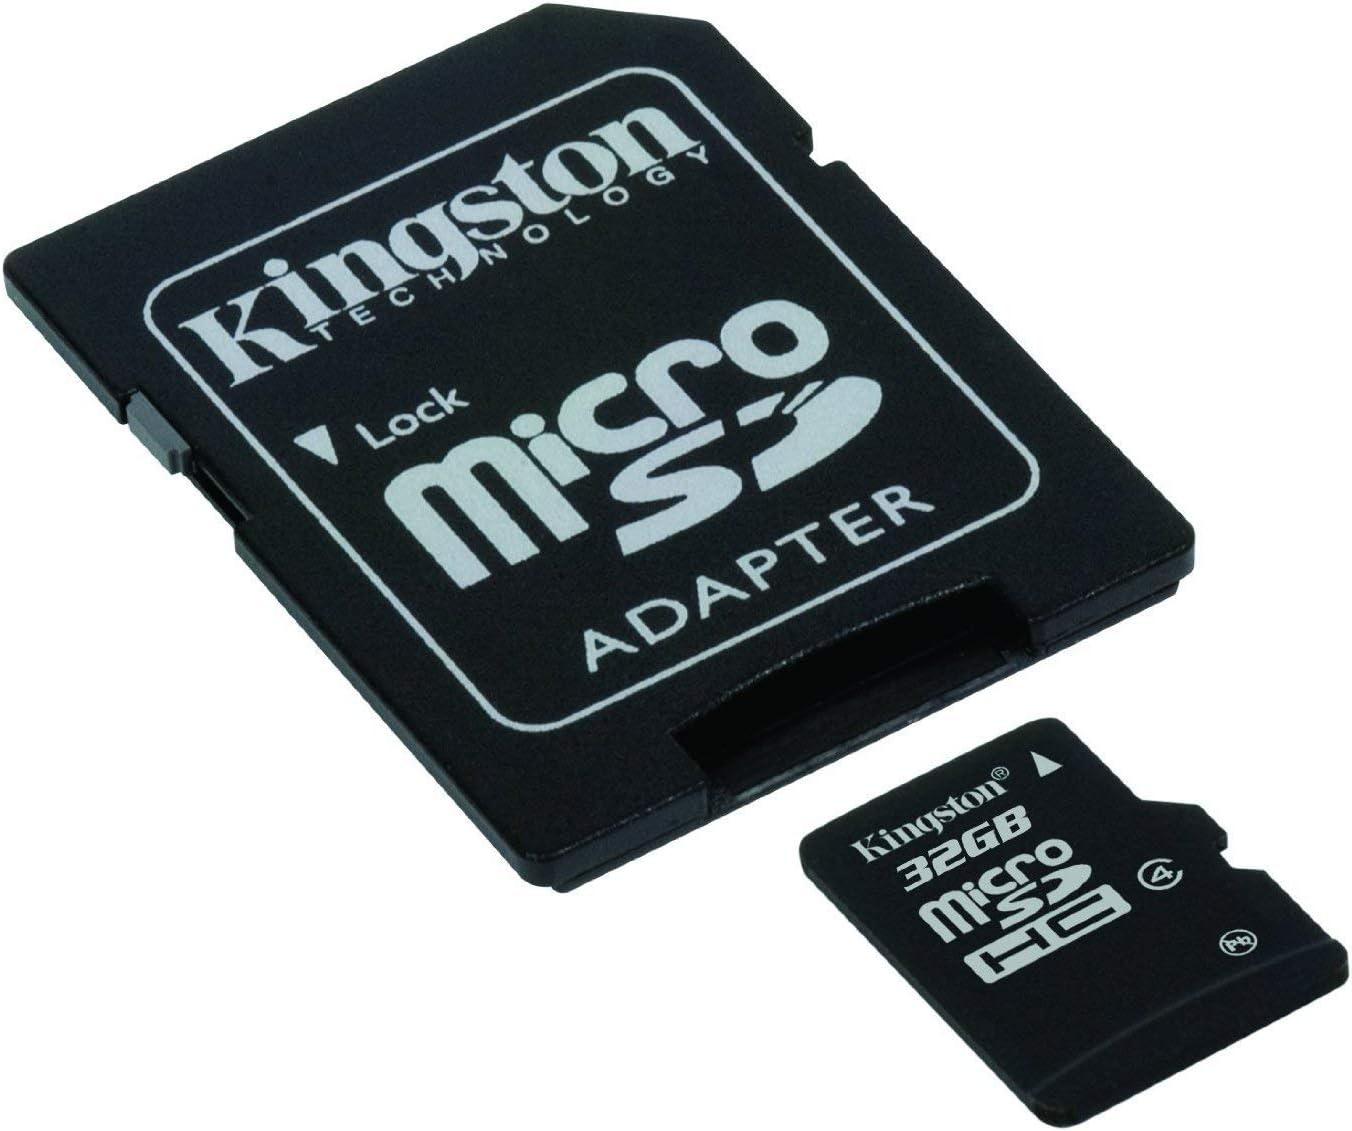 Kingston Sdc10g2 8gb Sd Memory Card Black Computers Accessories